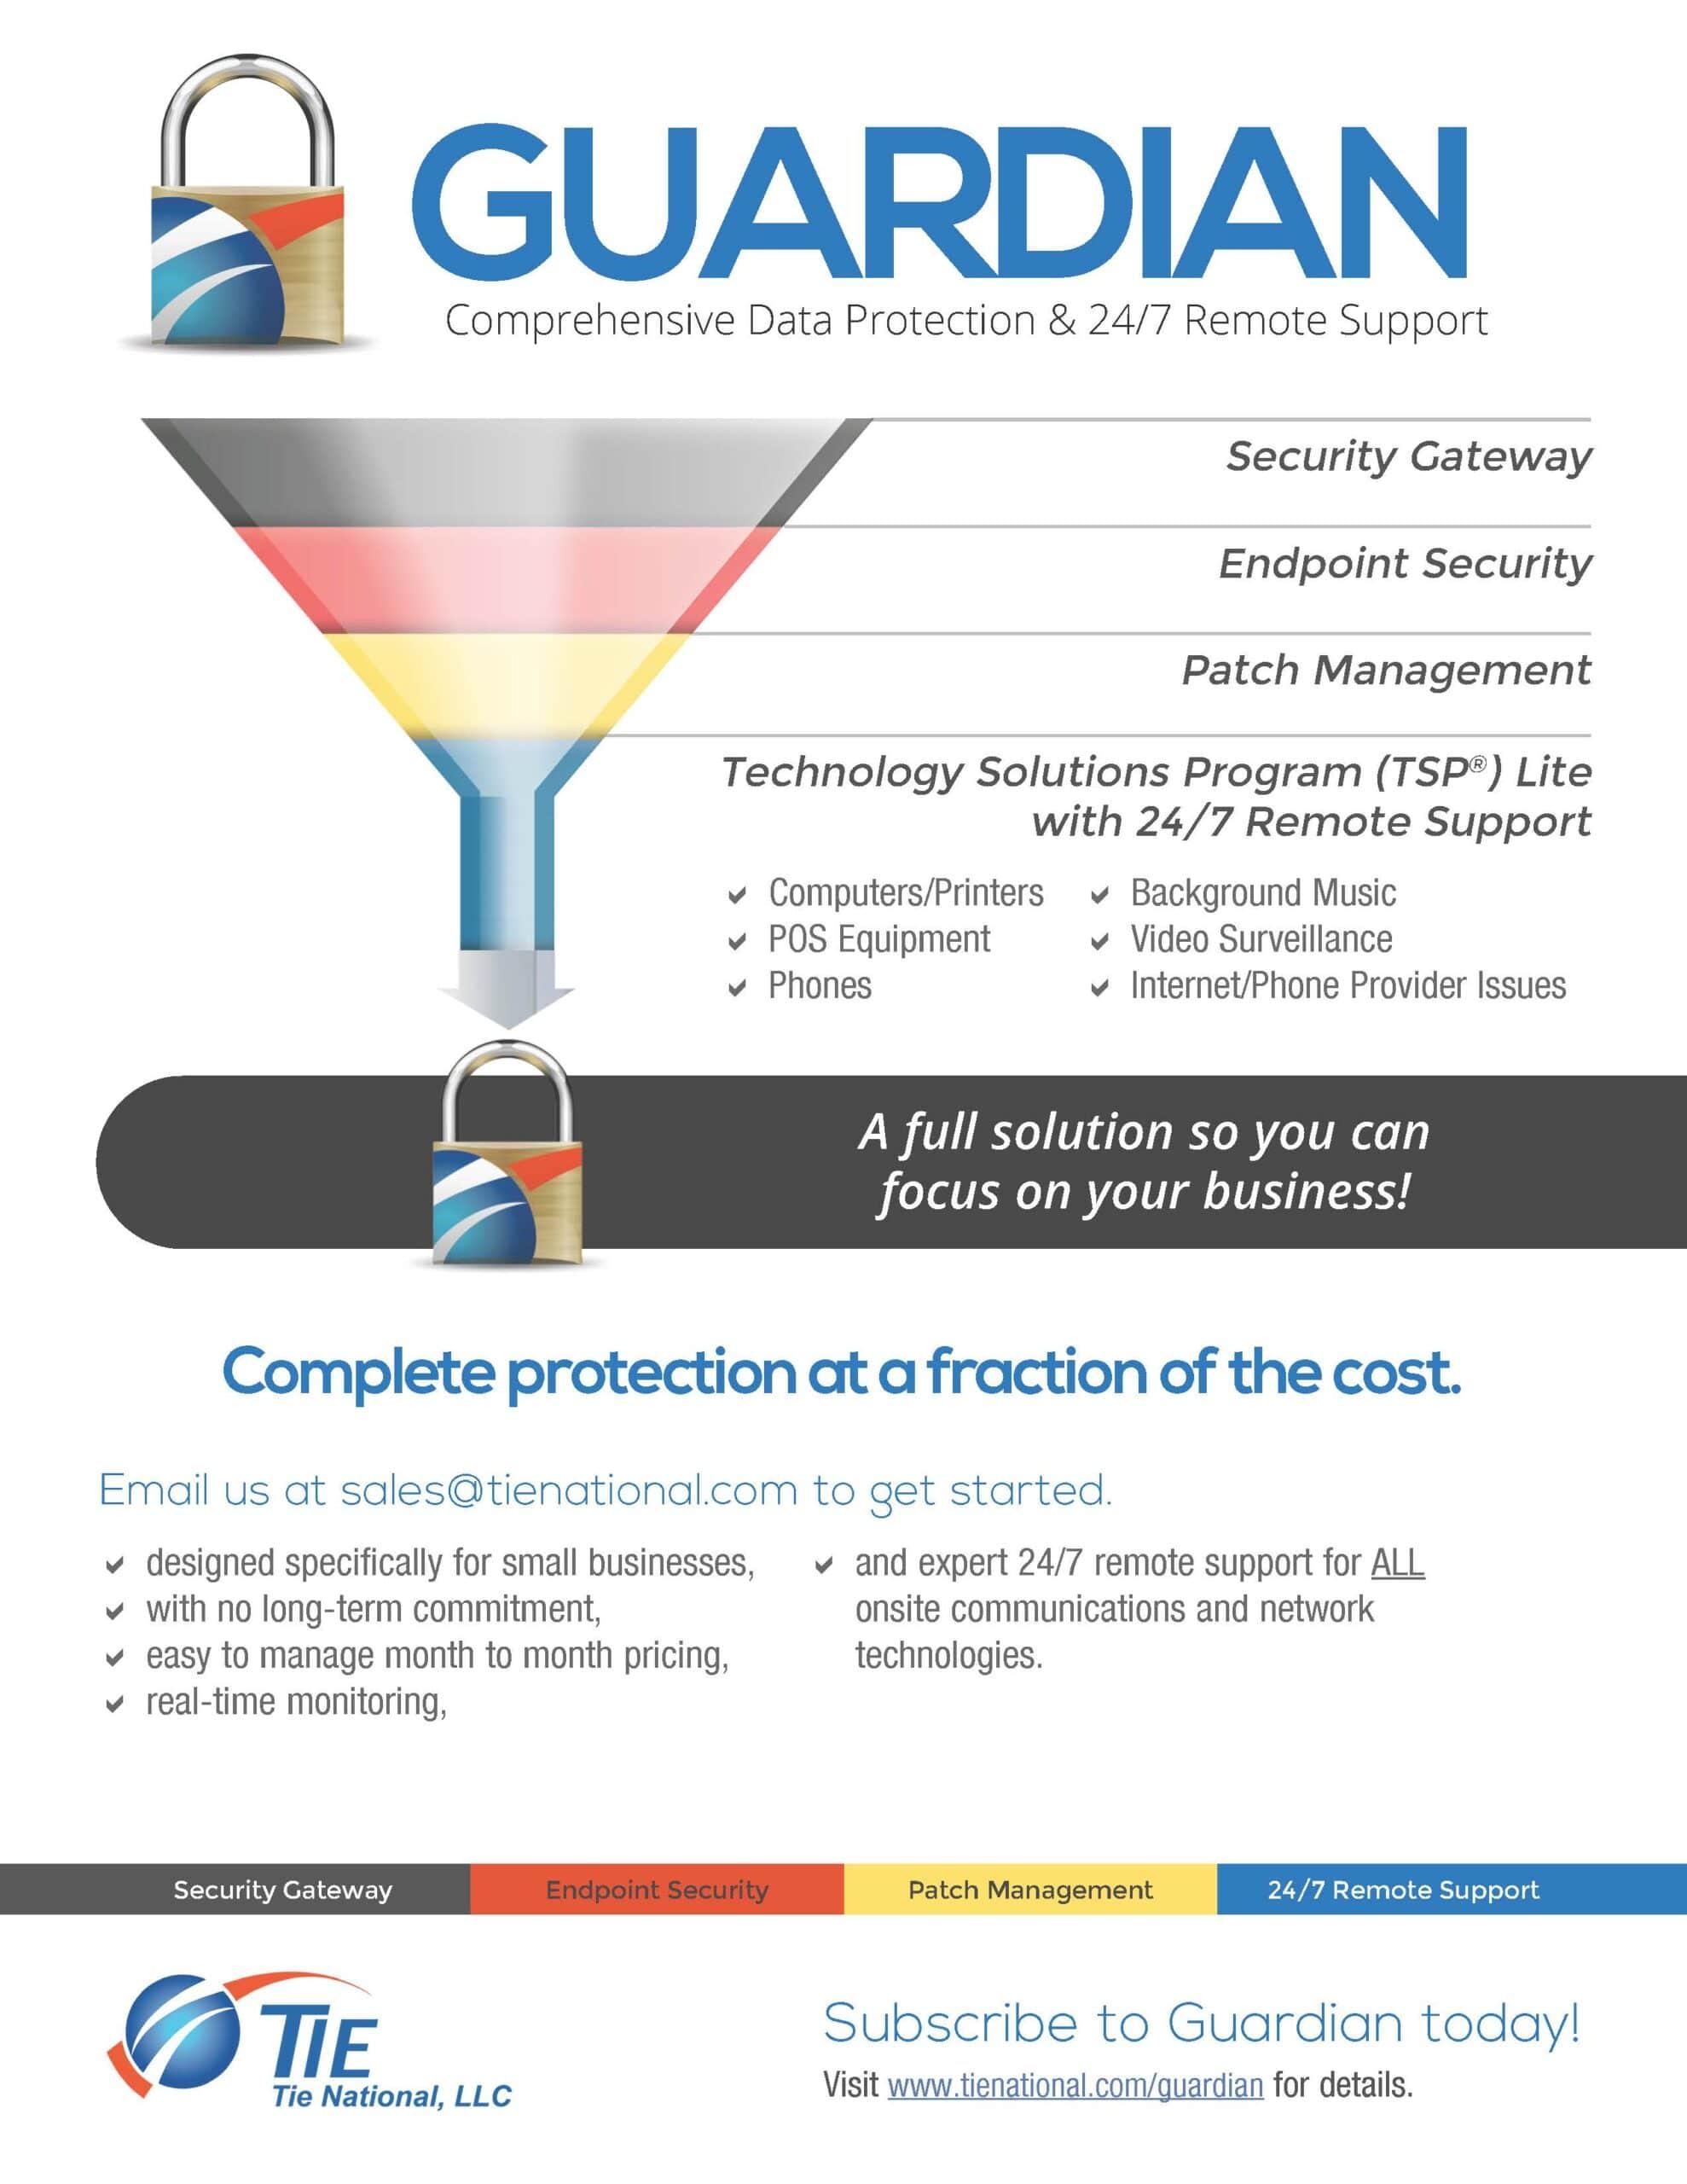 Guardian Data Protection